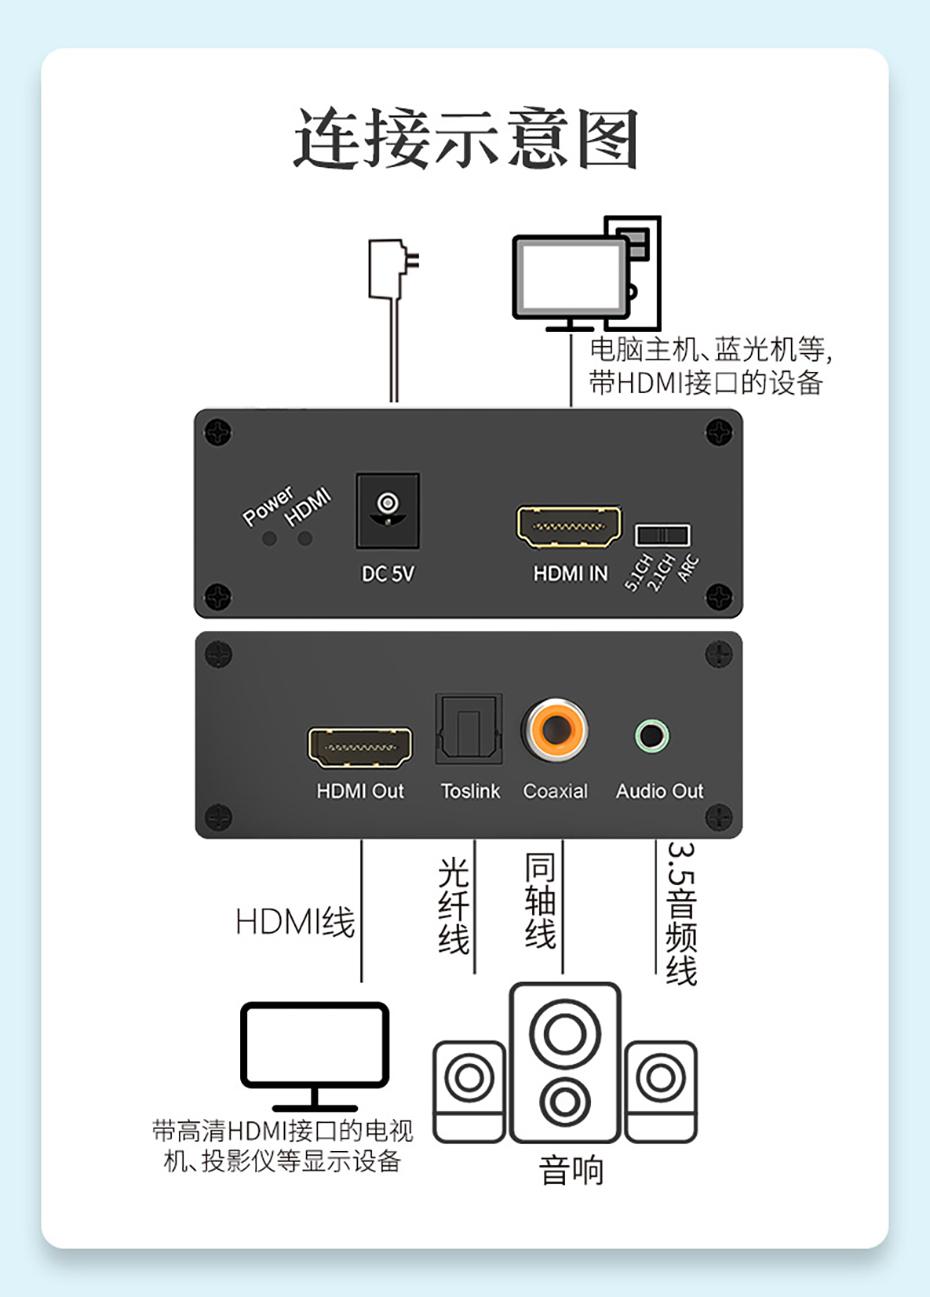 HDMI音频解码分离器HHA连接使用示意图